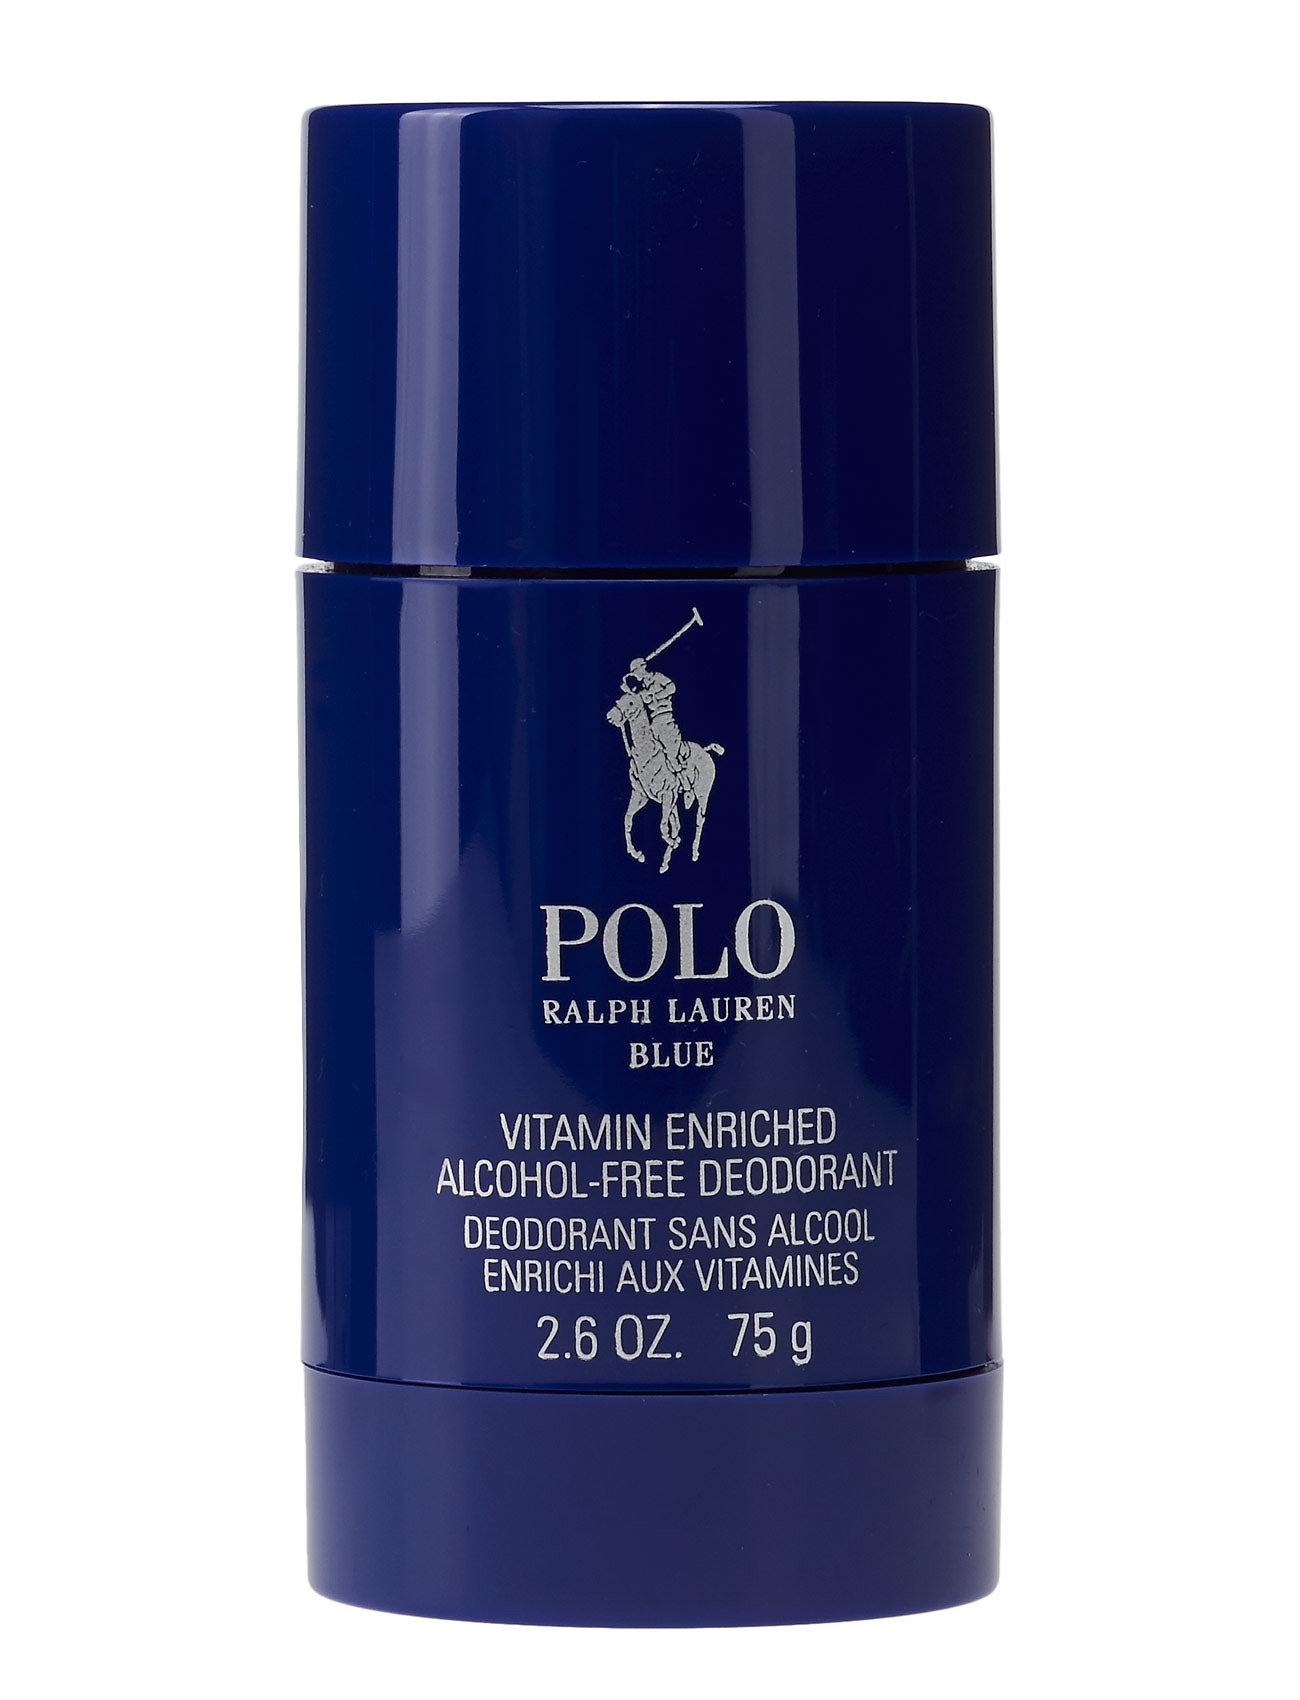 Polo blue eau de toilette deodorant stick 75 ml fra ralph lauren fra boozt.com dk